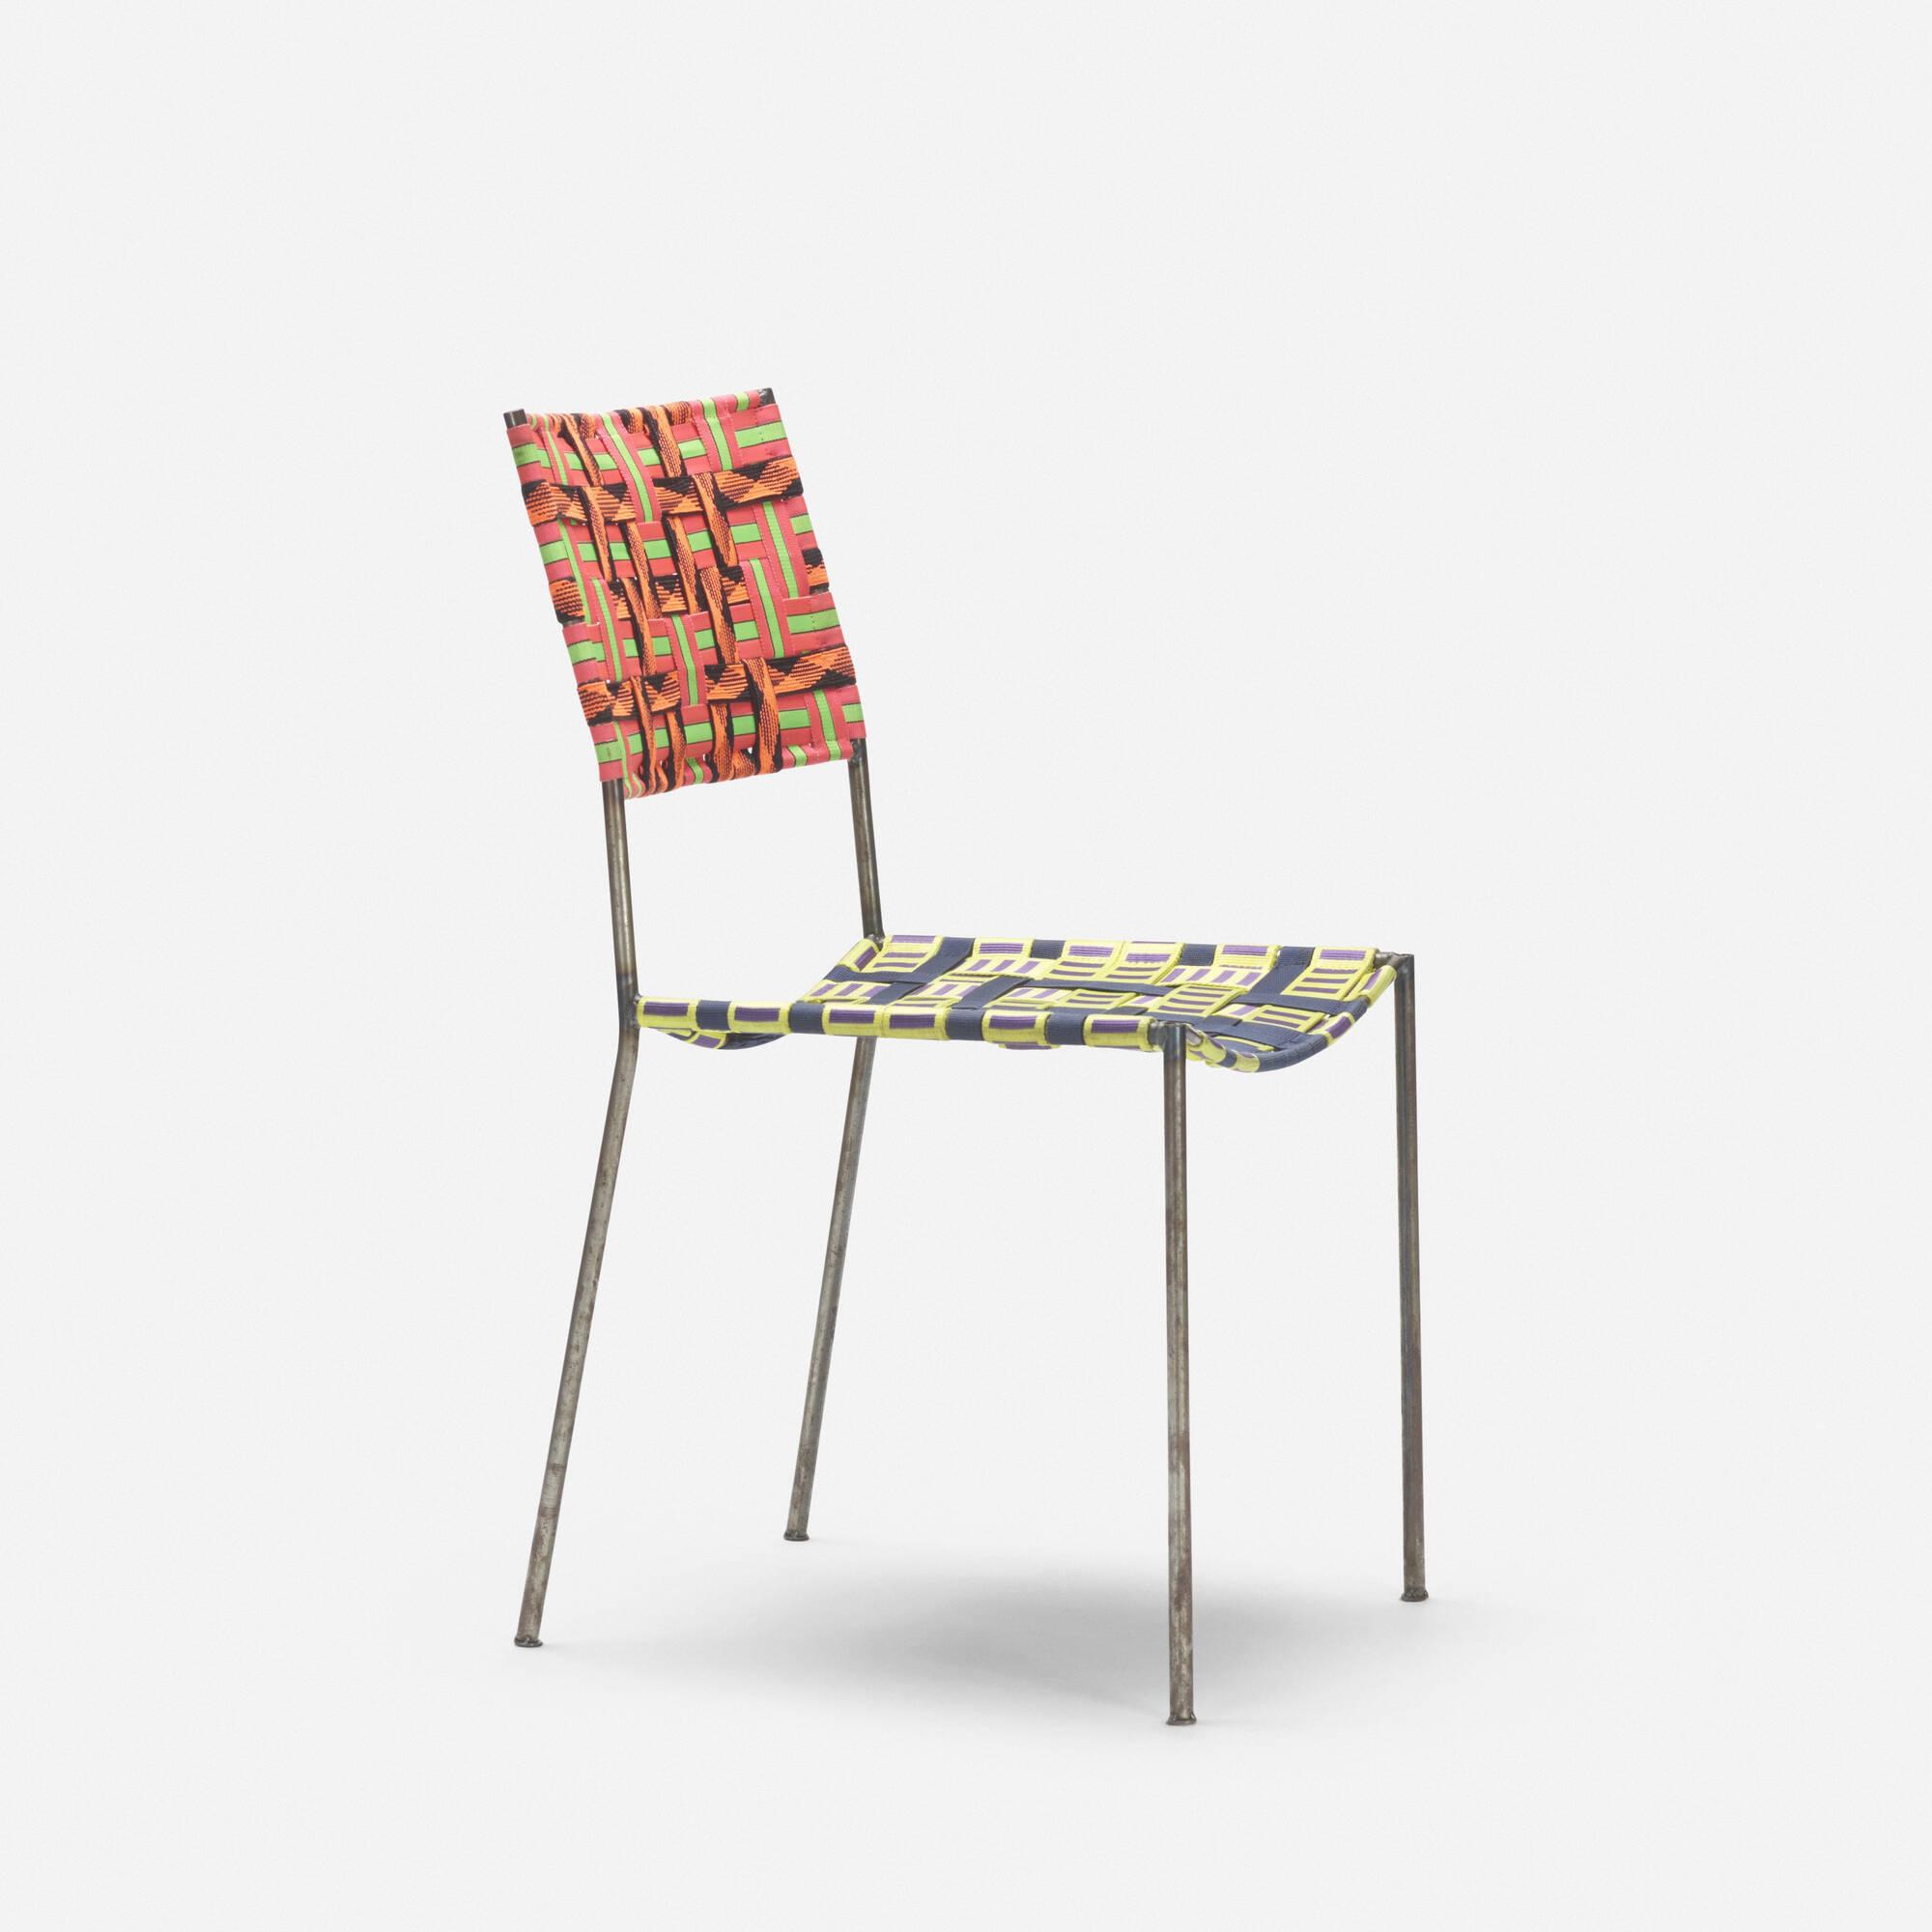 235: Franz West / Onkel chair (2 of 3)